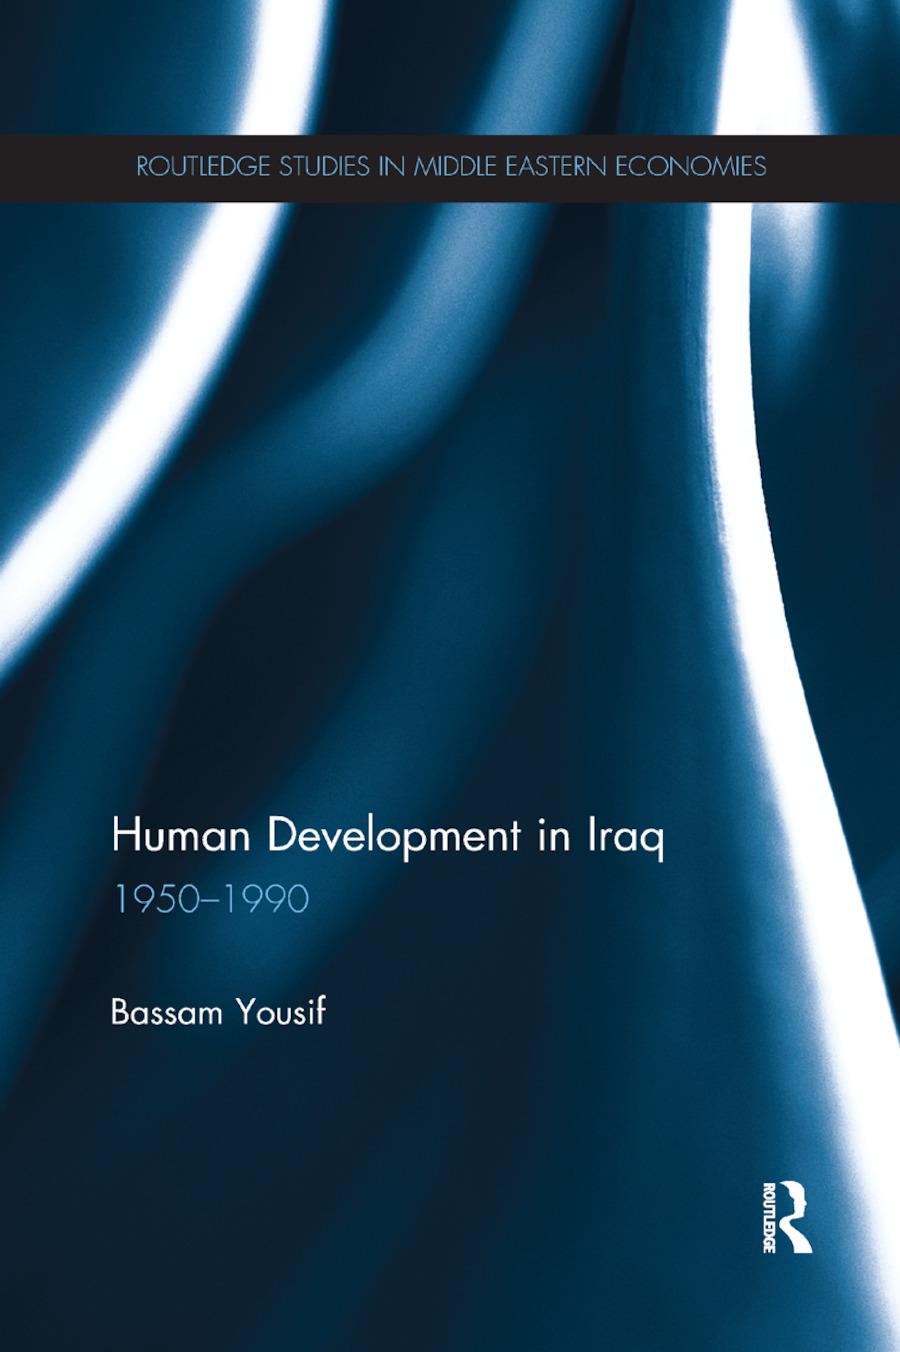 Human Development in Iraq: 1950-1990 book cover